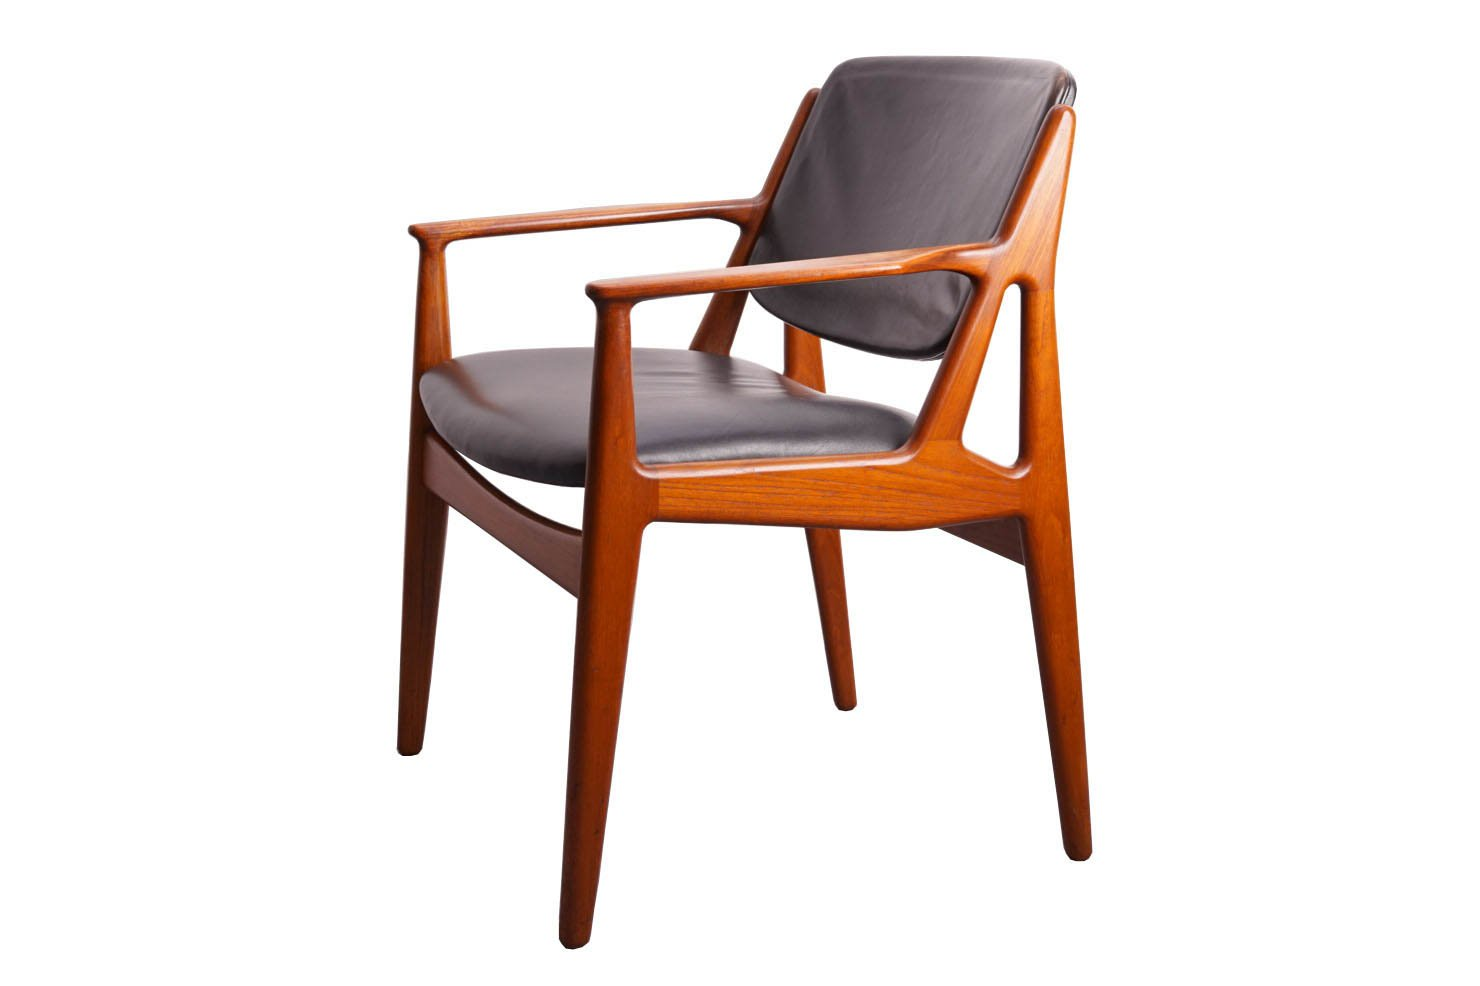 Mid Century Teak Leather Chair By Arne Vodder For Vamo Sondeborg